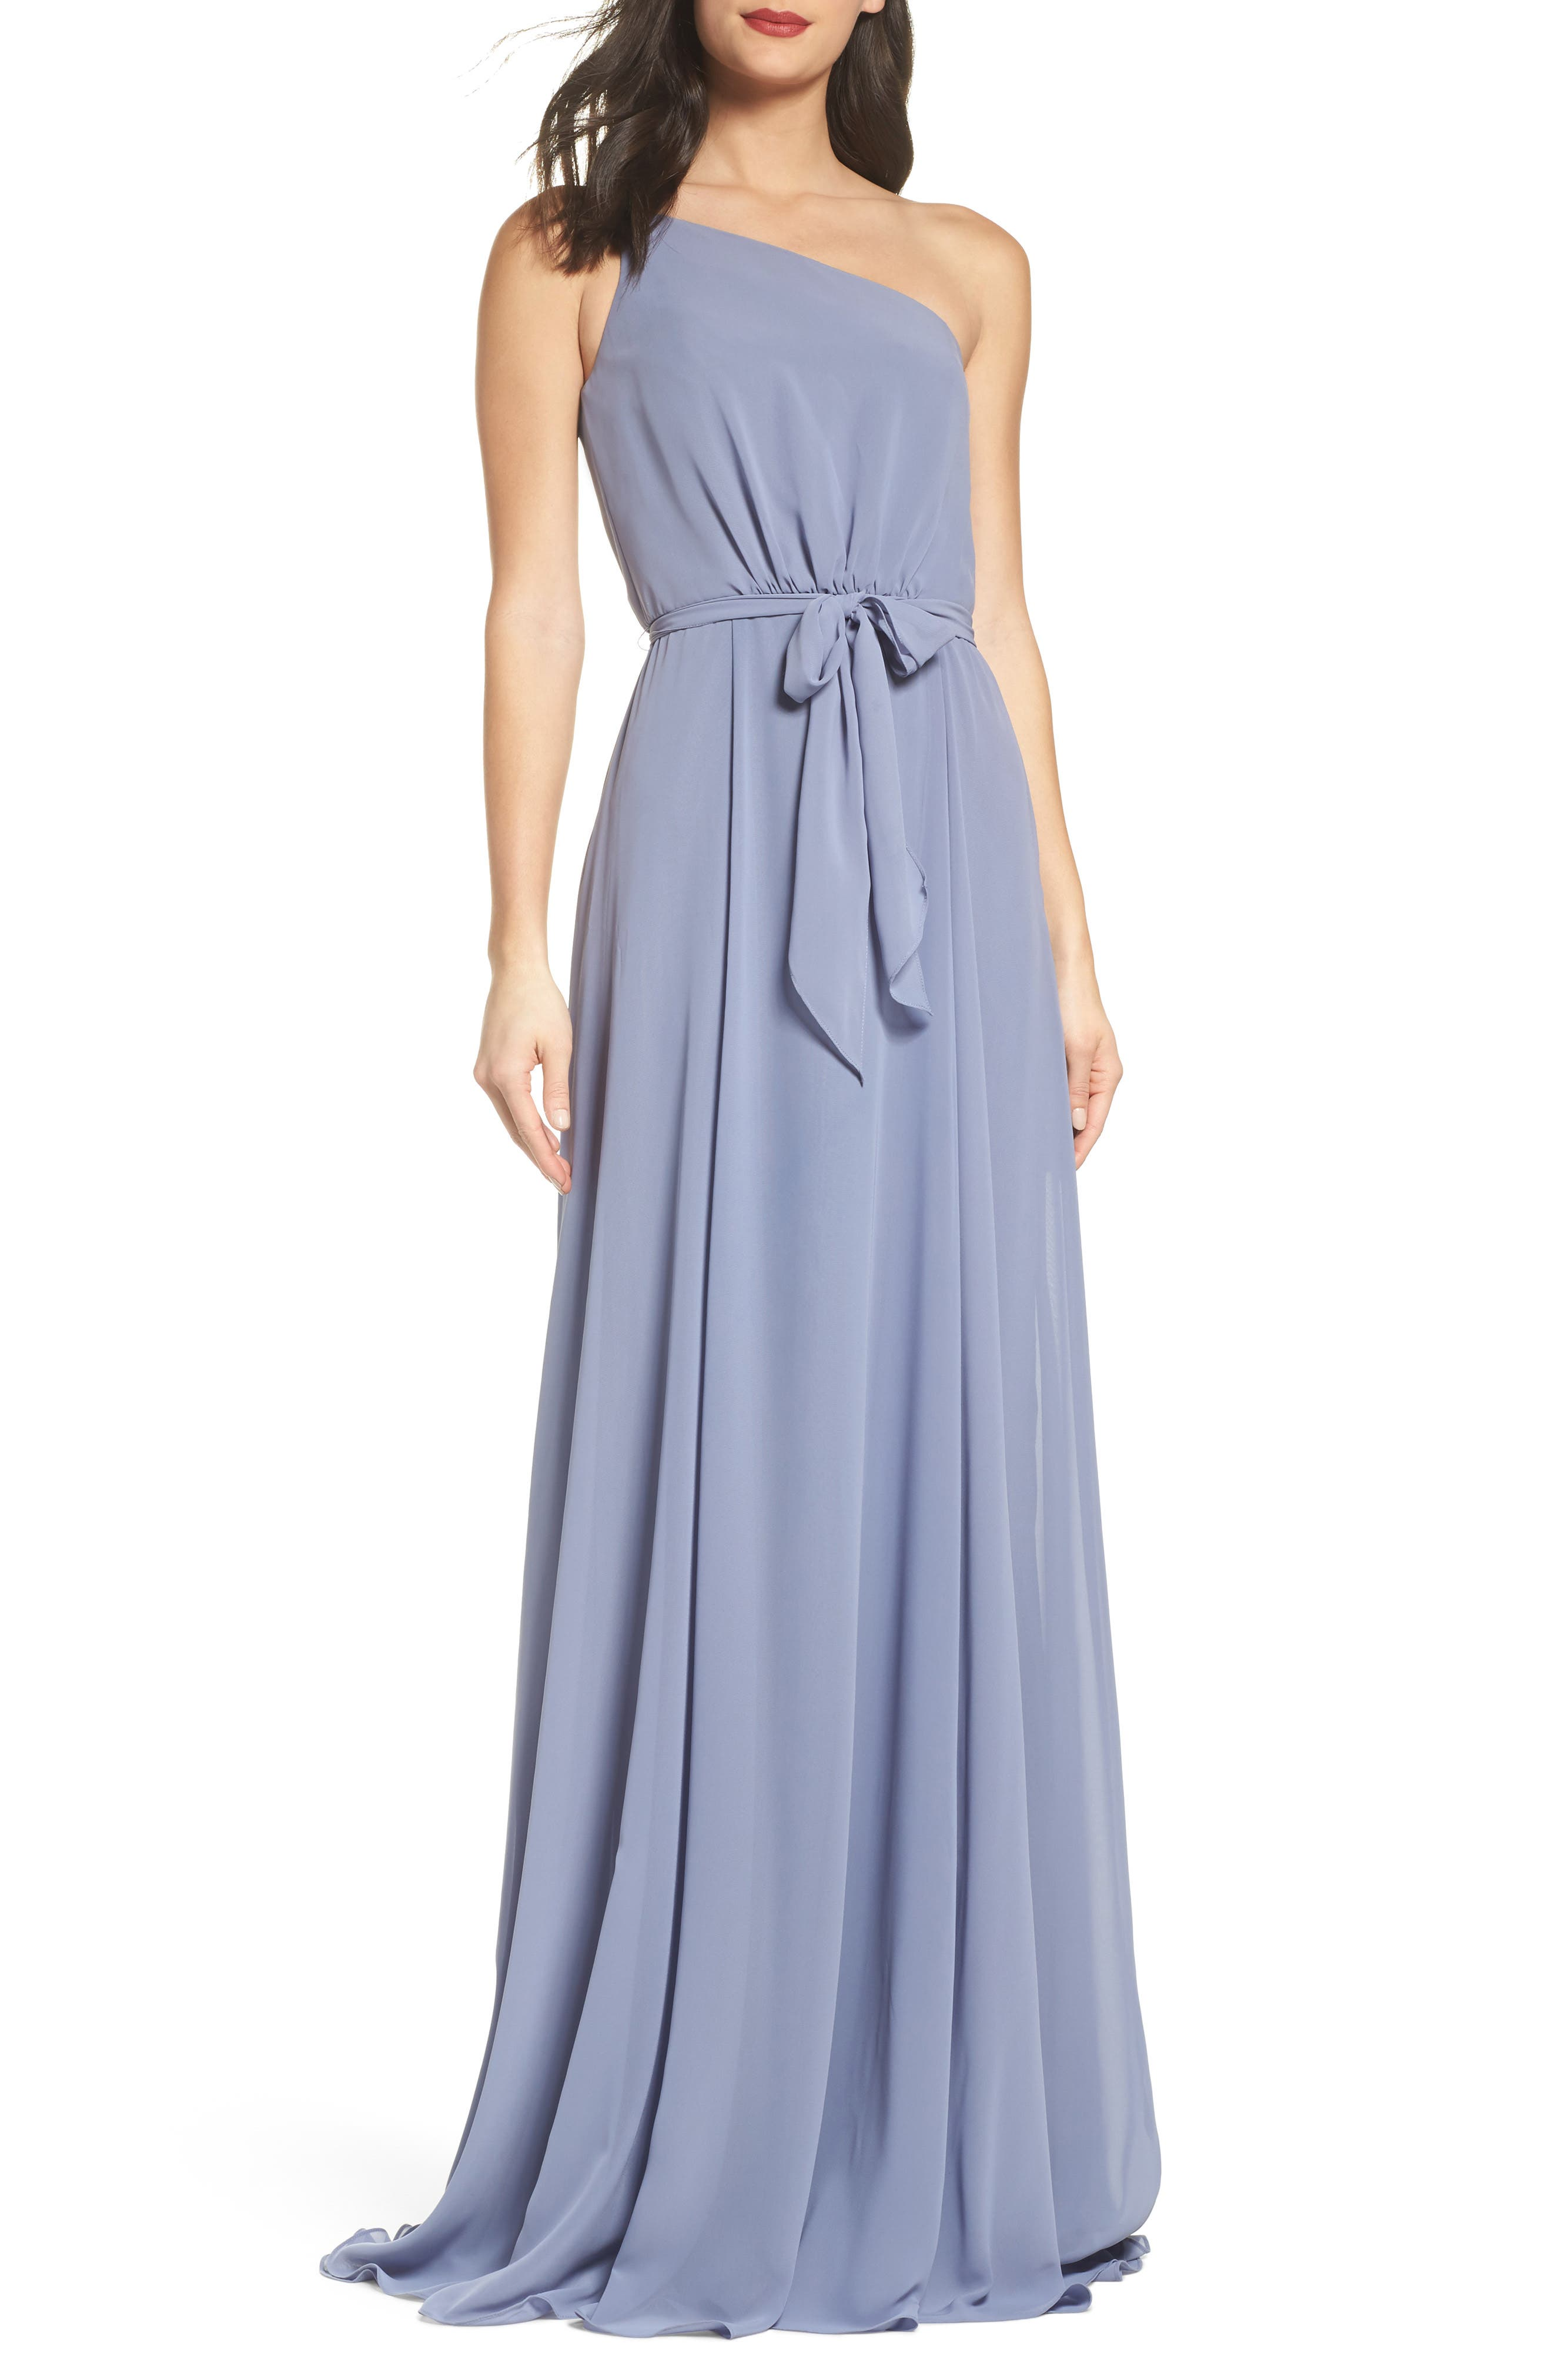 One-Shoulder Chiffon A-Line Gown,                             Main thumbnail 1, color,                             020